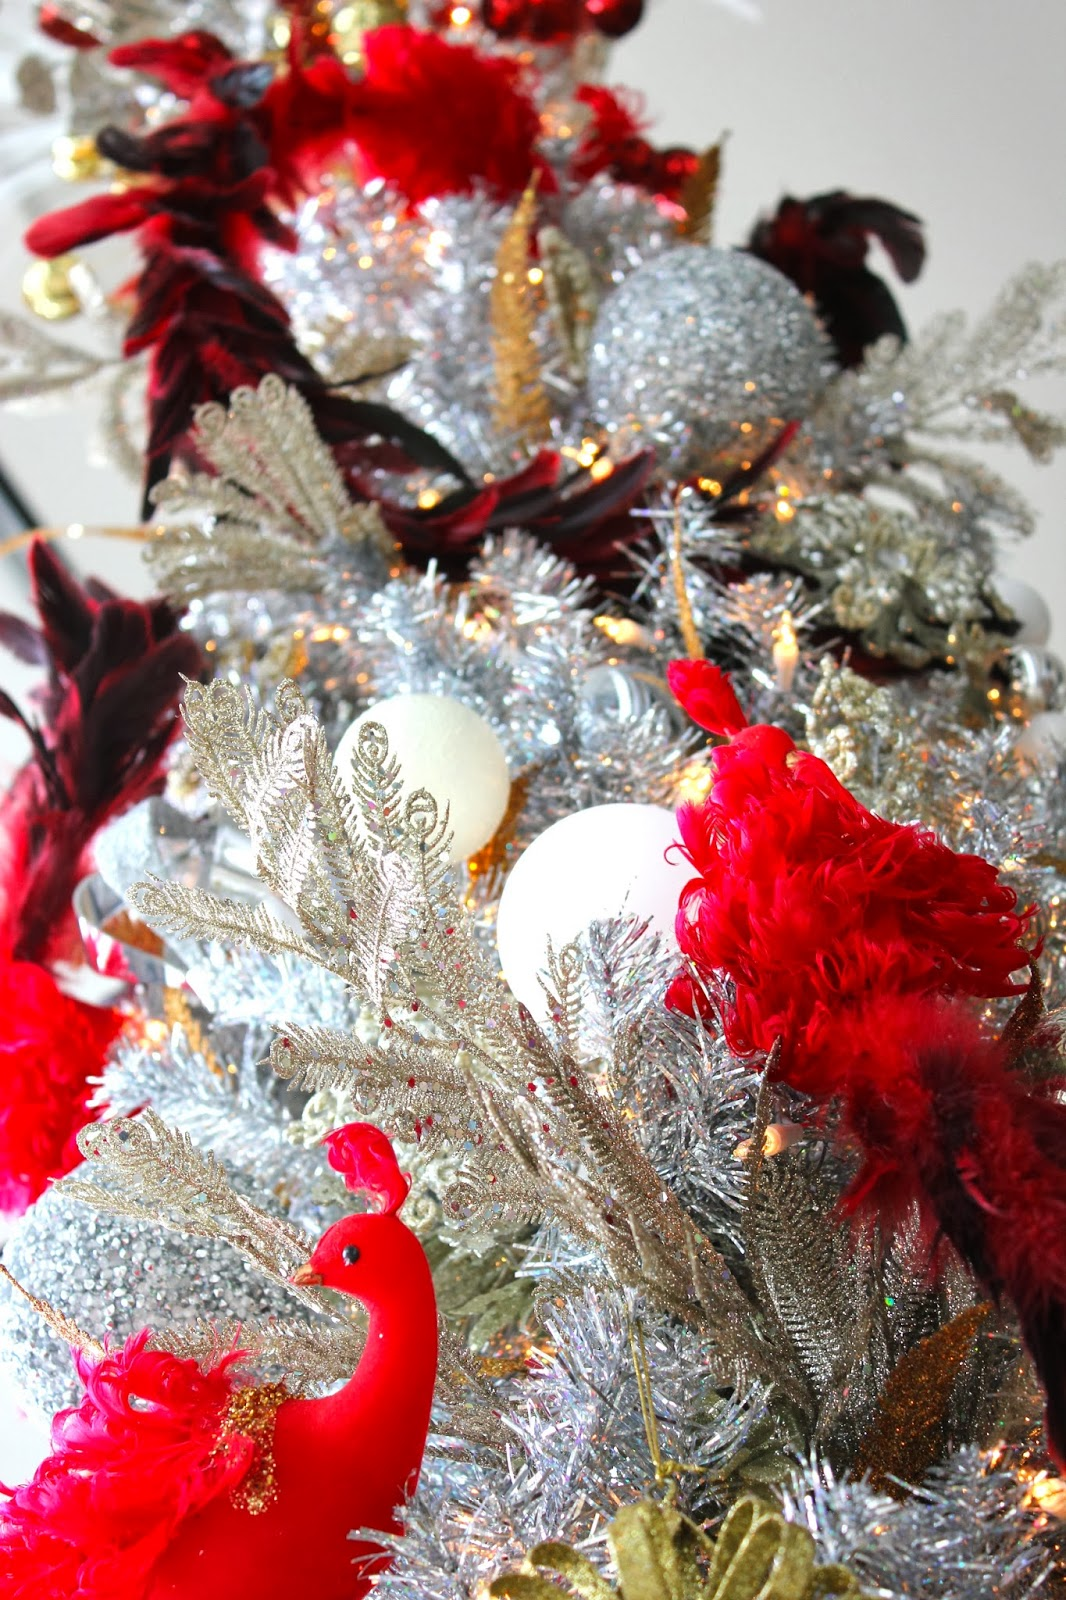 JoJo Herda: A Feathery and Silver Christmas Tree